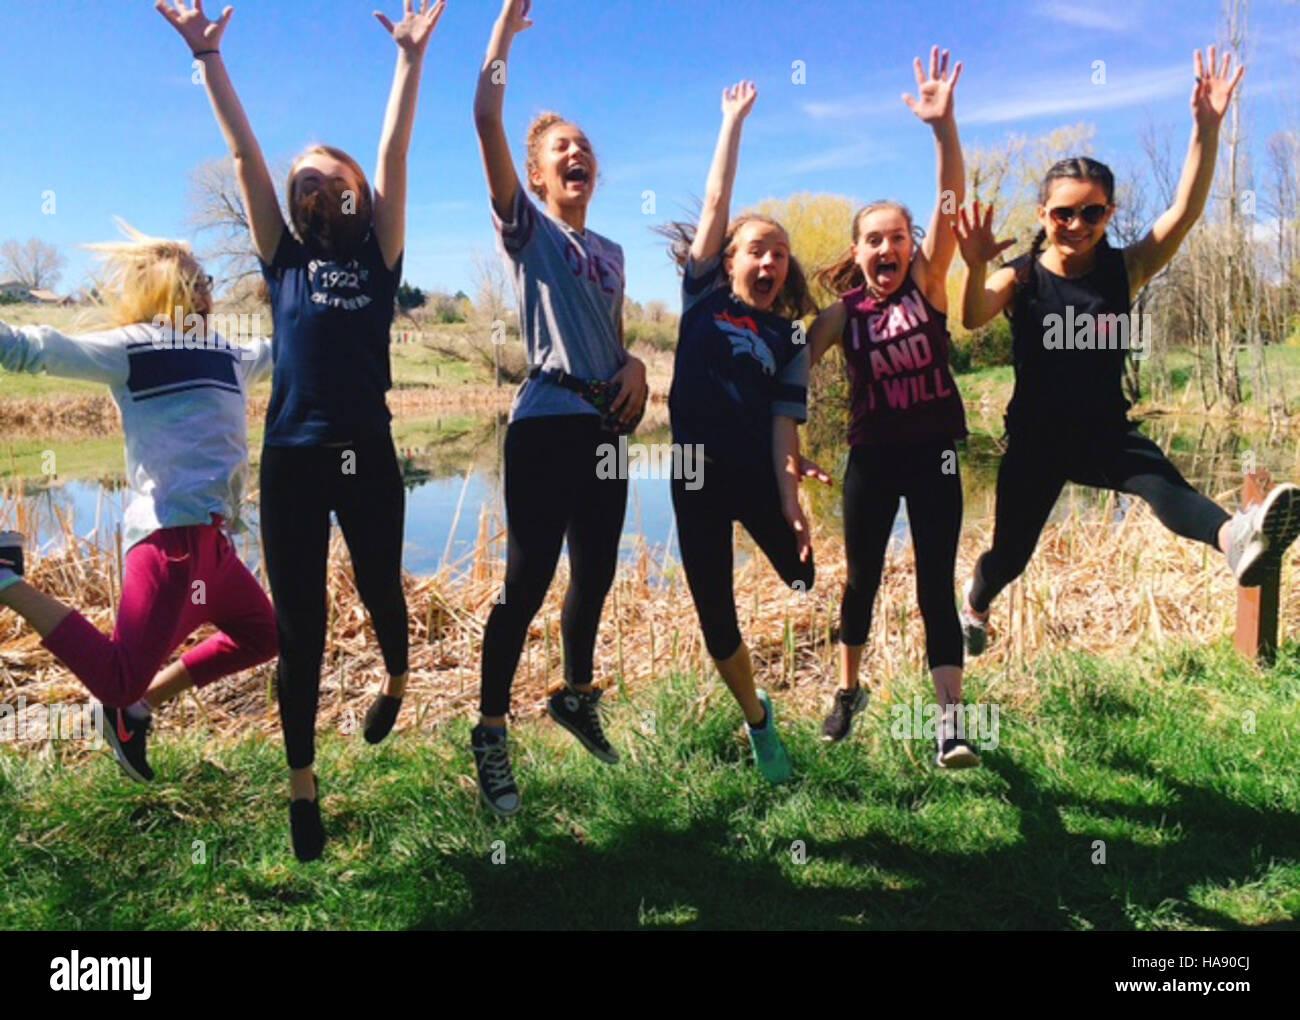 26550248832 usfwsmtnprairie Earth Day - 2016 Imagen De Stock